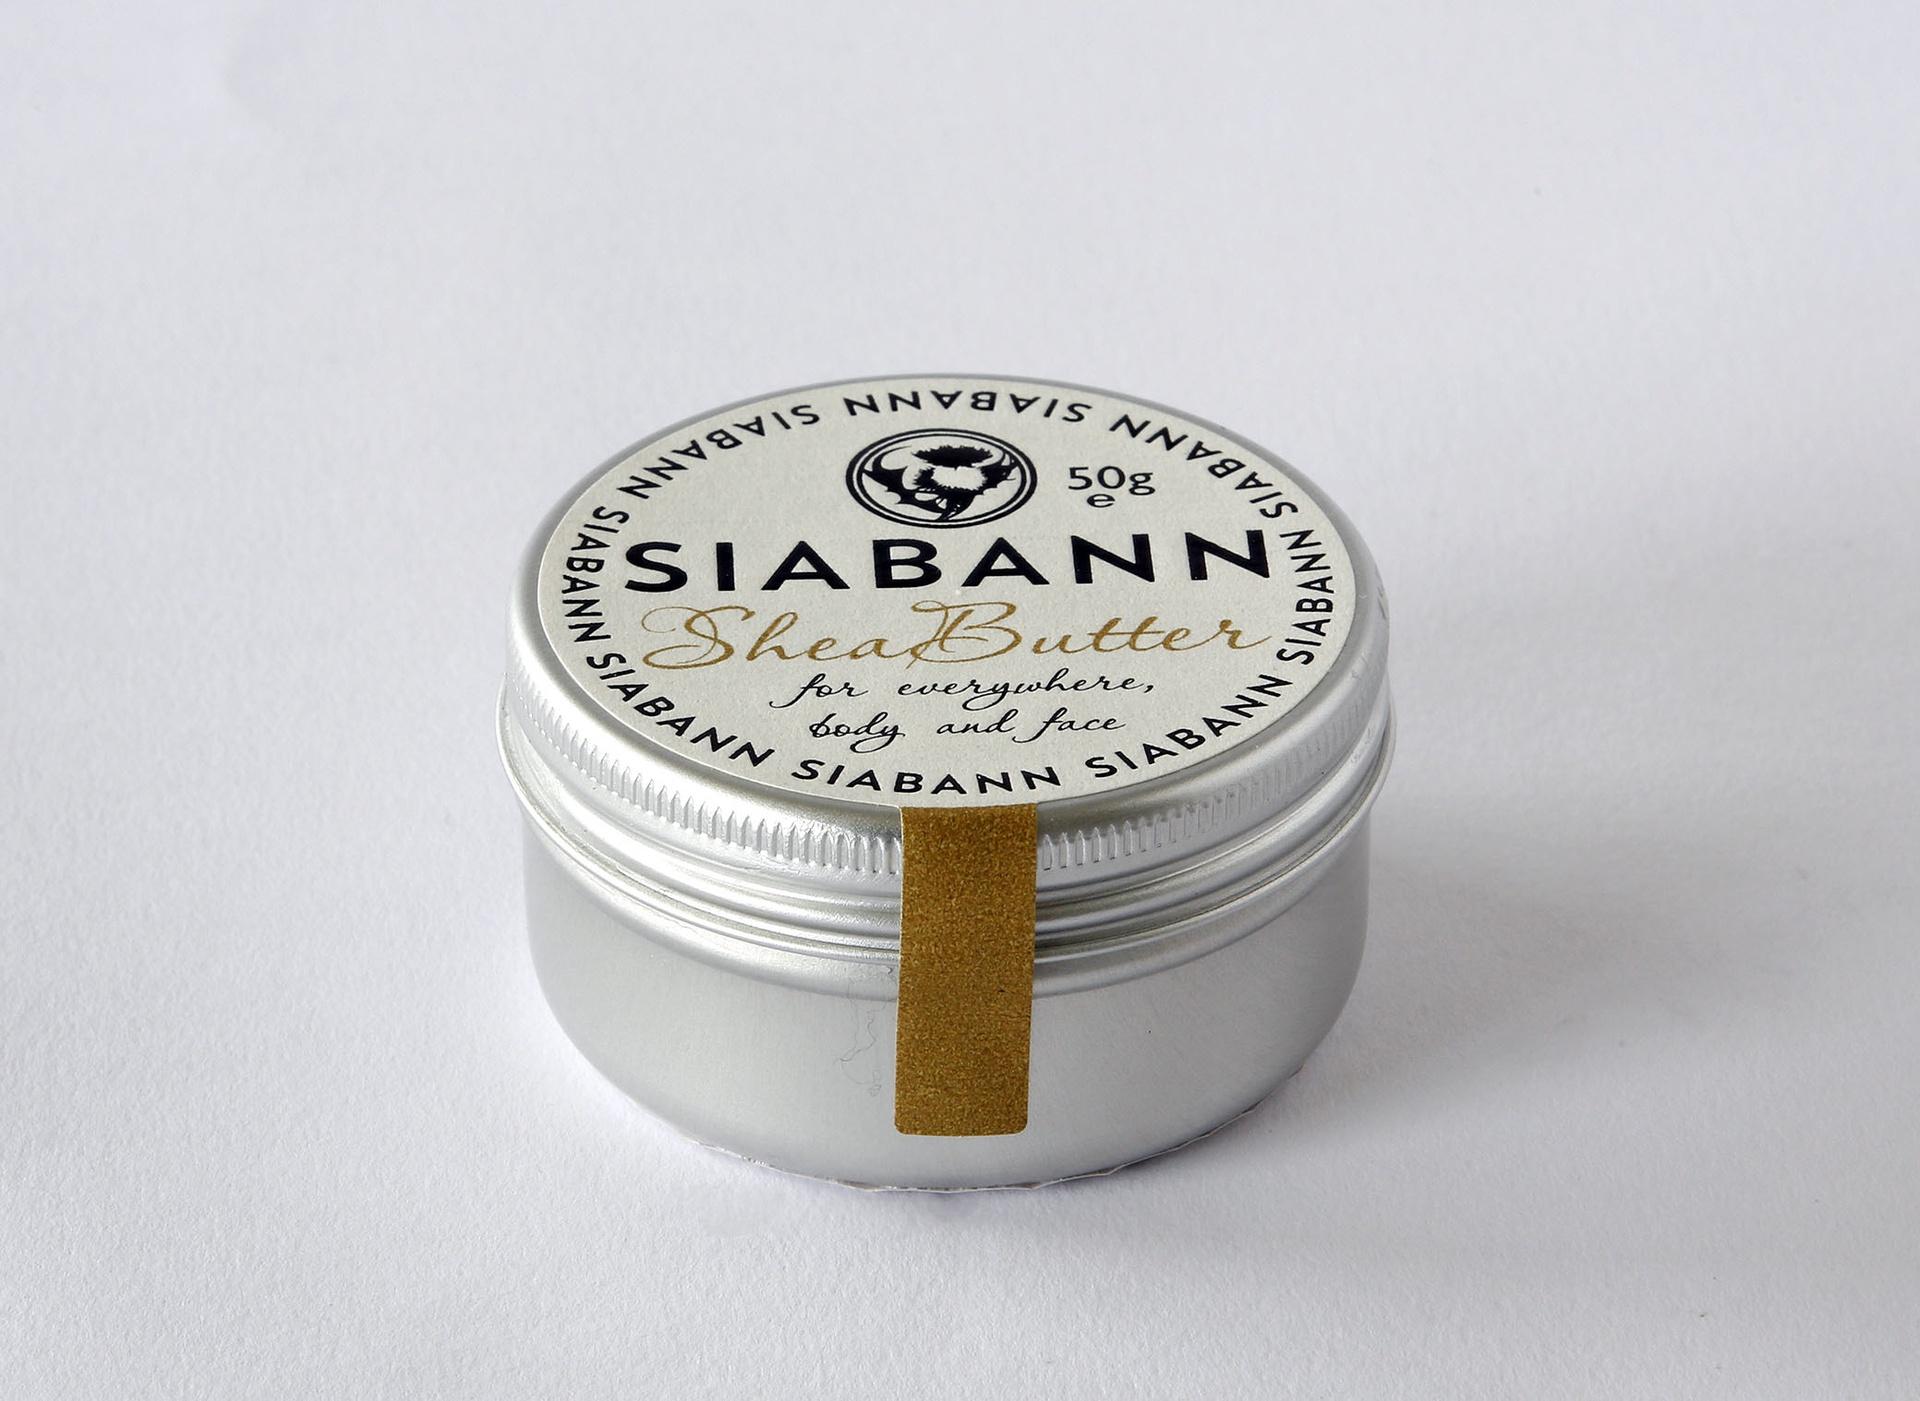 Shea butter 50g